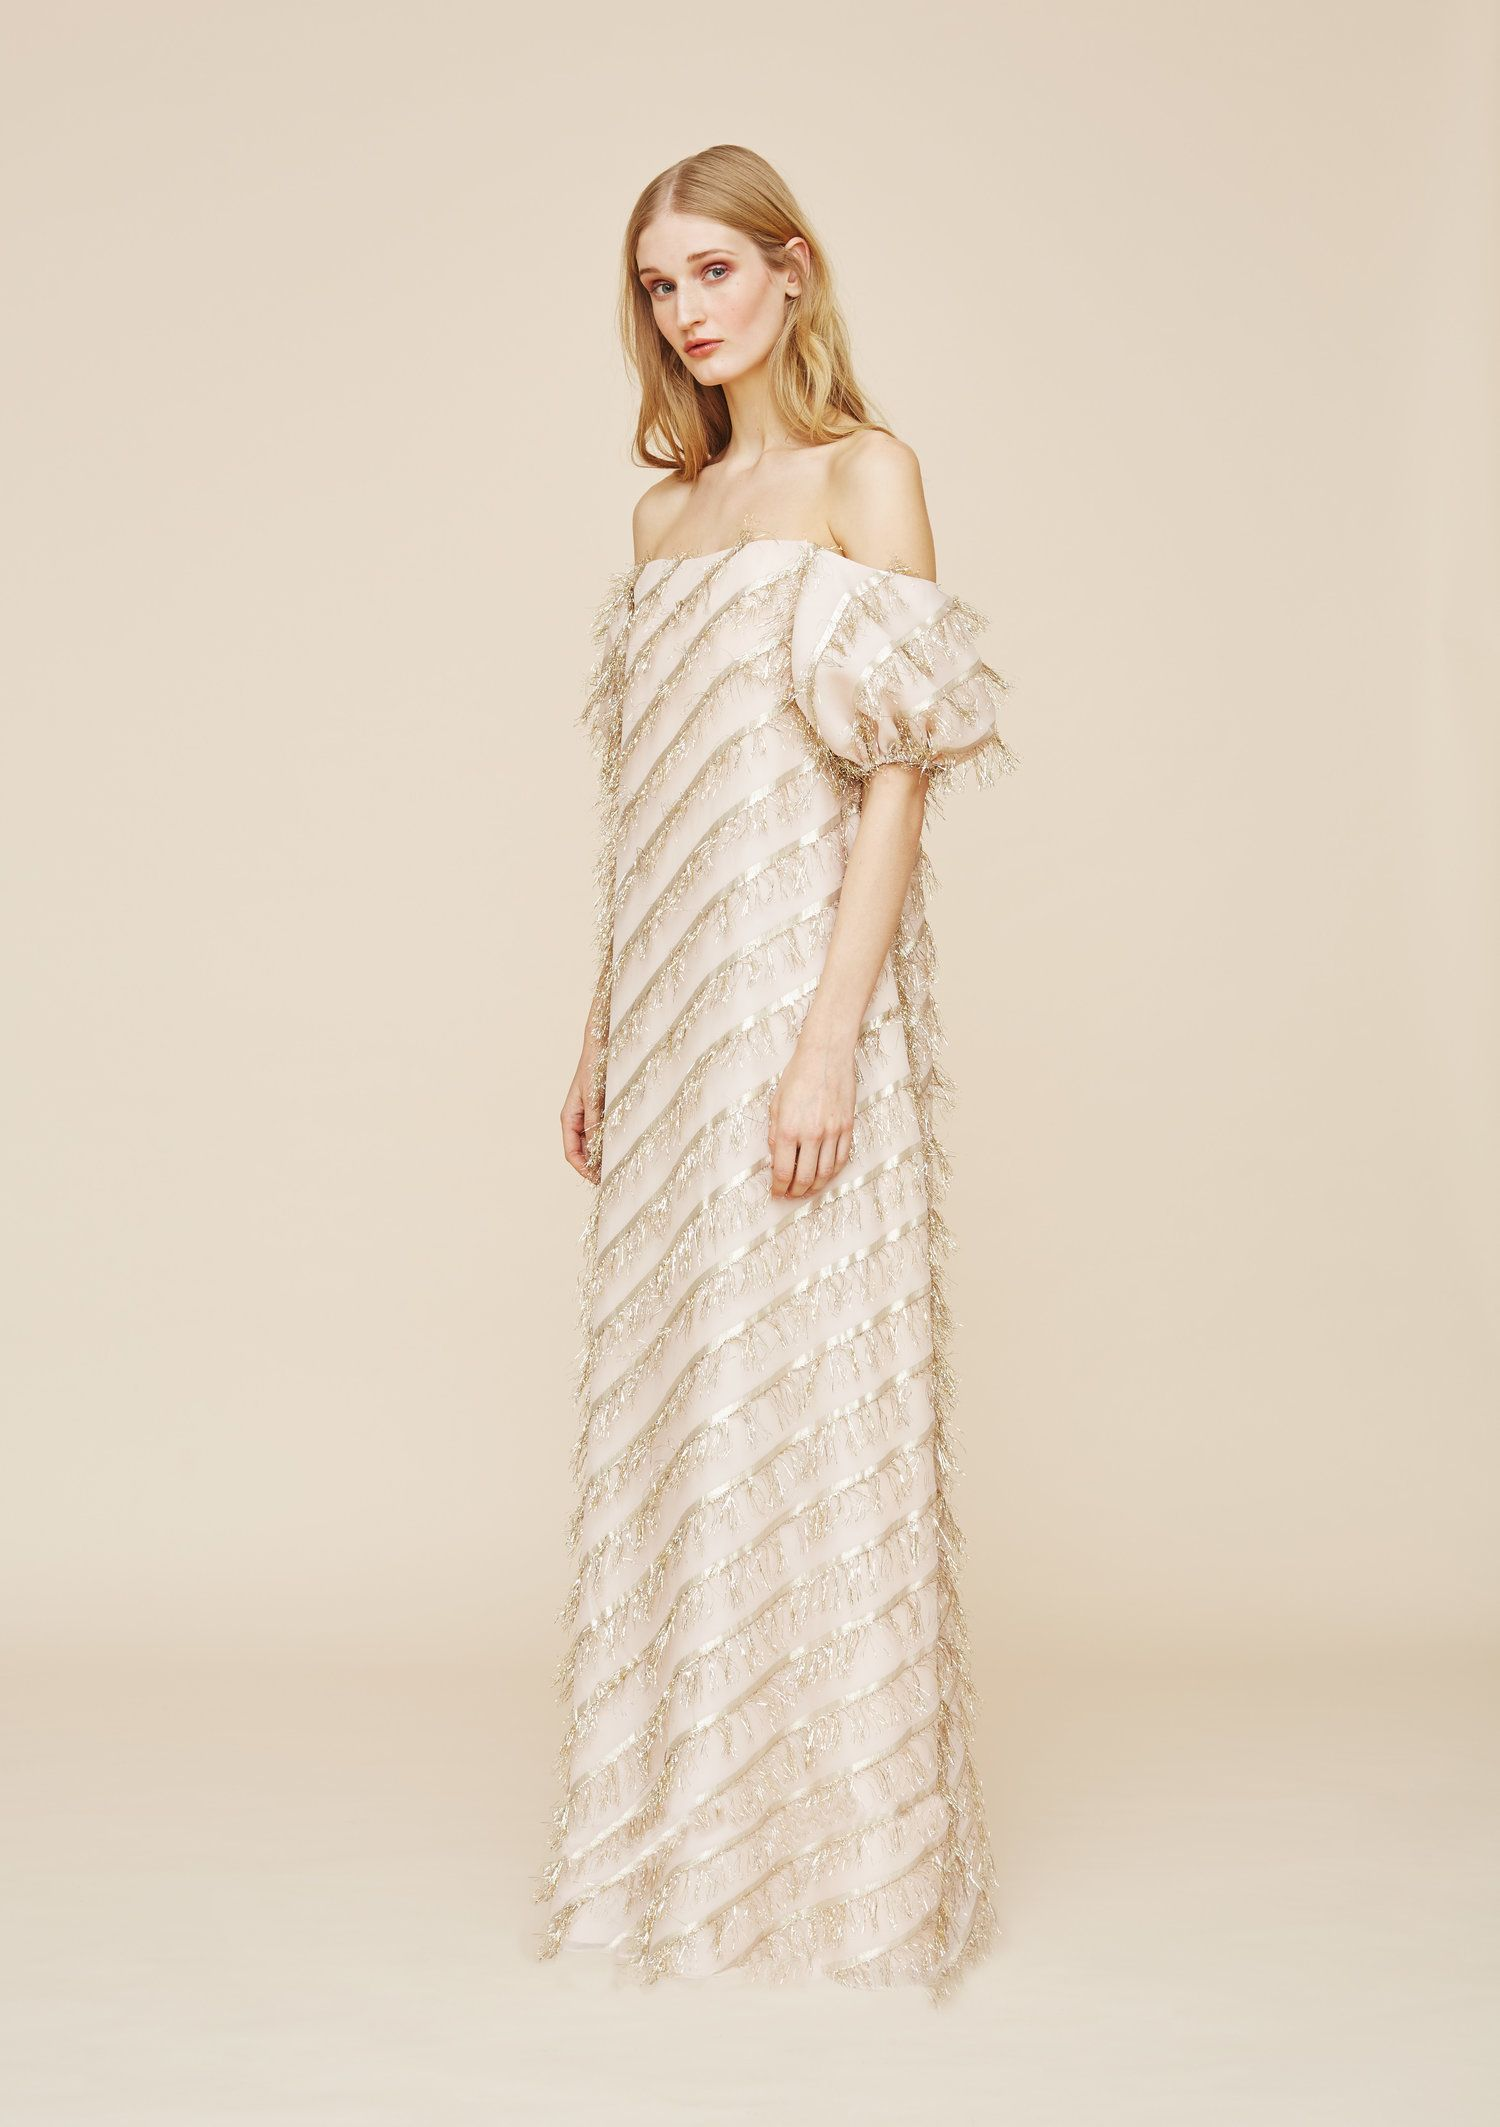 A marie sideg wish list pinterest gowns shoulder and